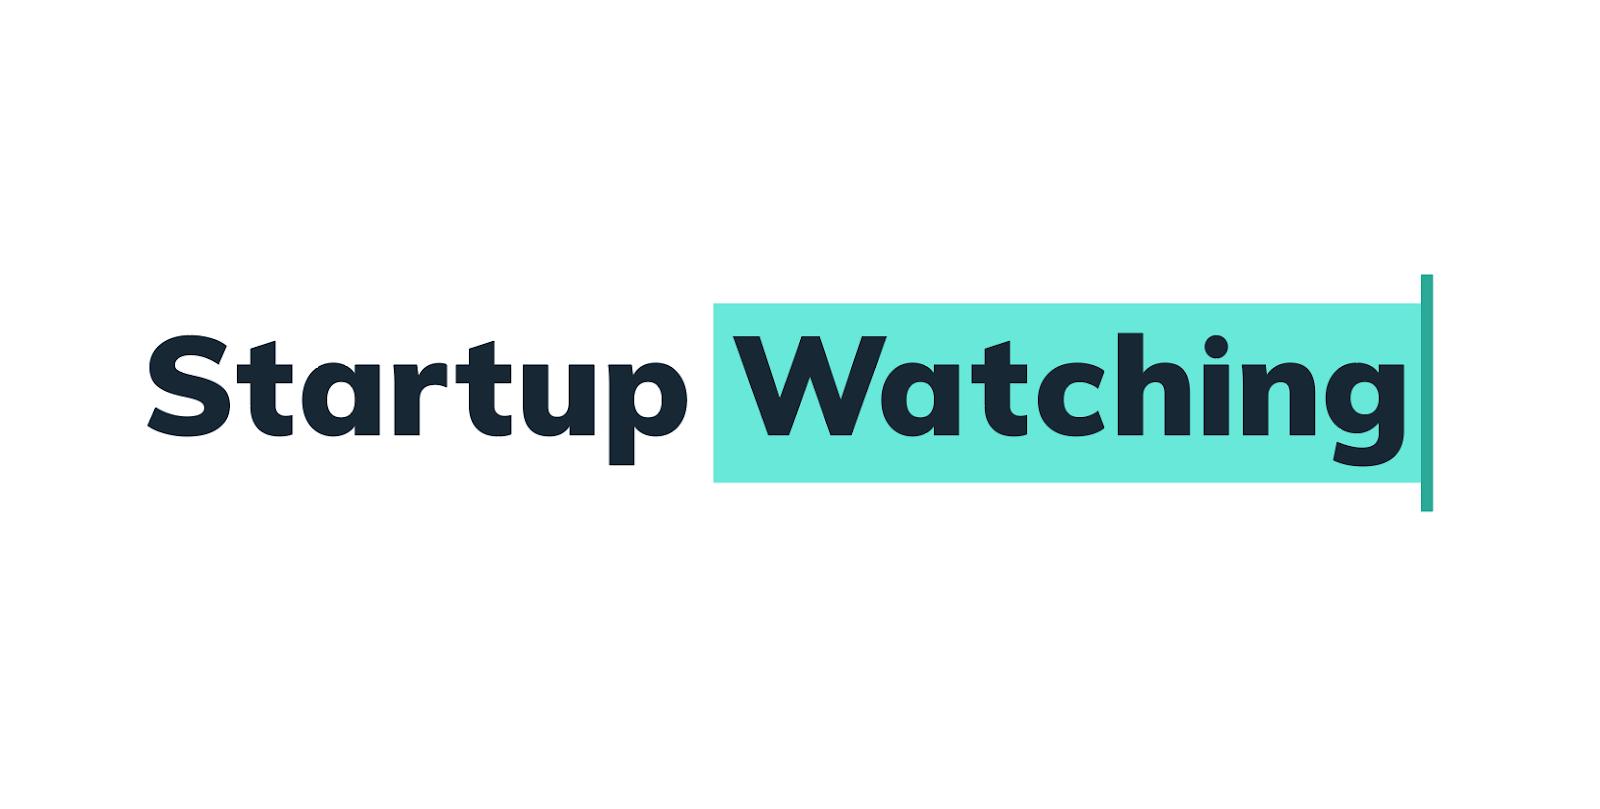 StartupWatching